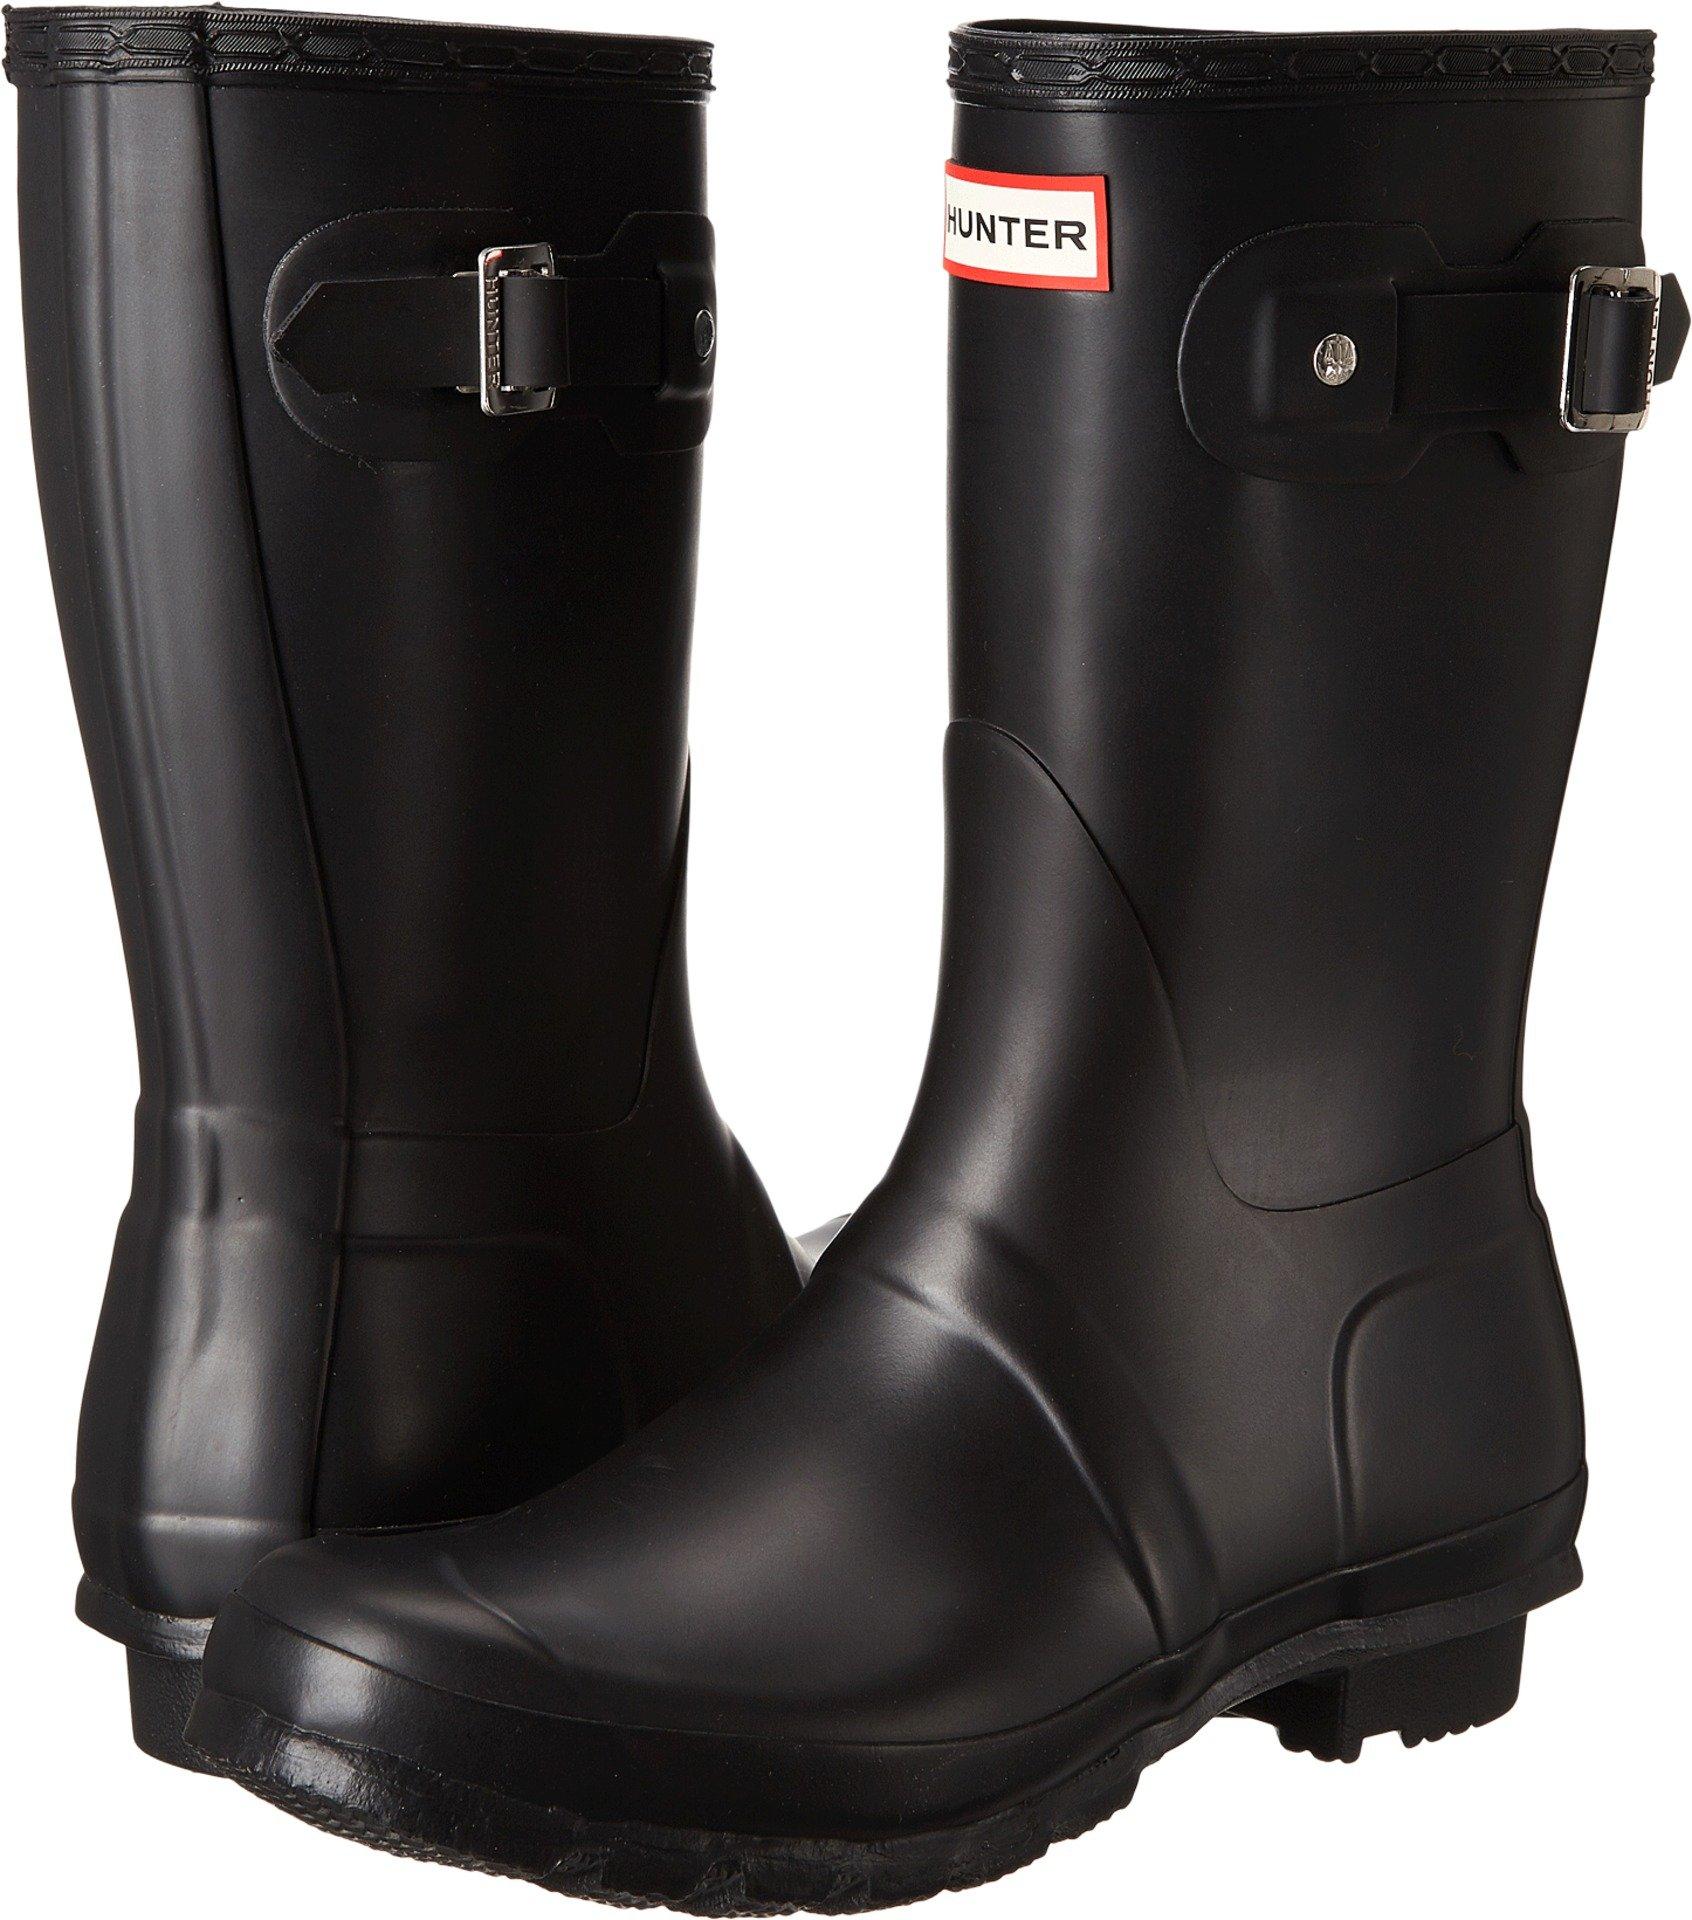 Hunter Womens Original Short Black Matte Rain Boot - 7 B(M) US